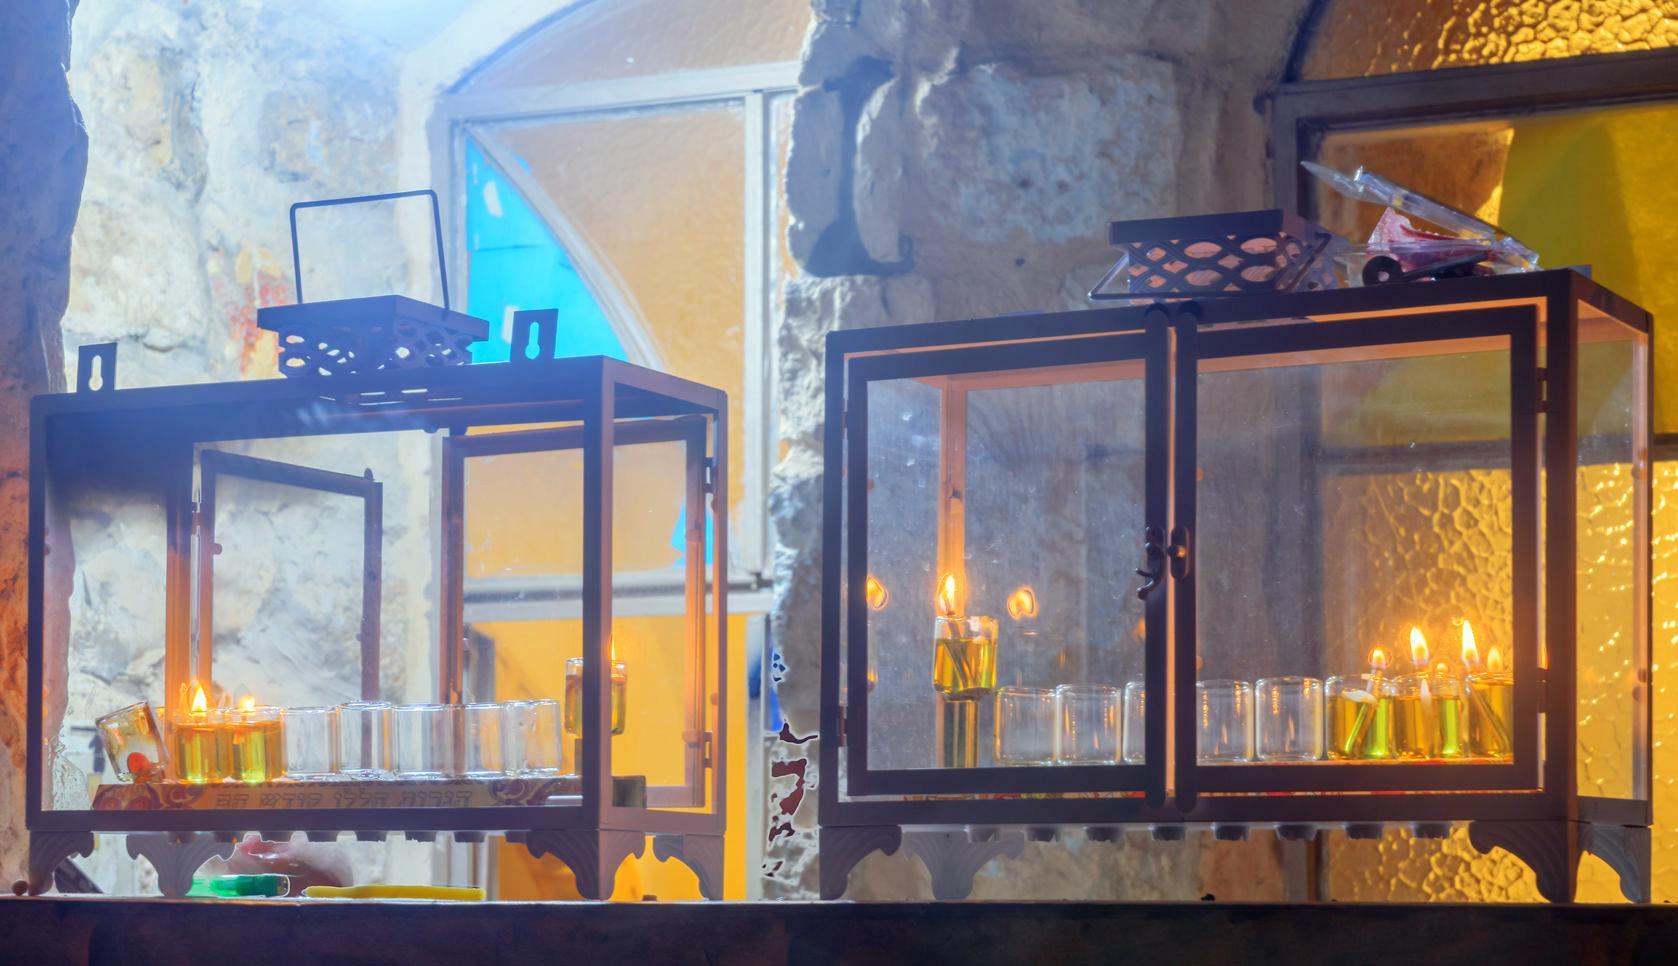 Traditional Hanukkah Menorahs (Hanukkiahs) with oil lamps in the Jewish Quarter of Safed, Israel